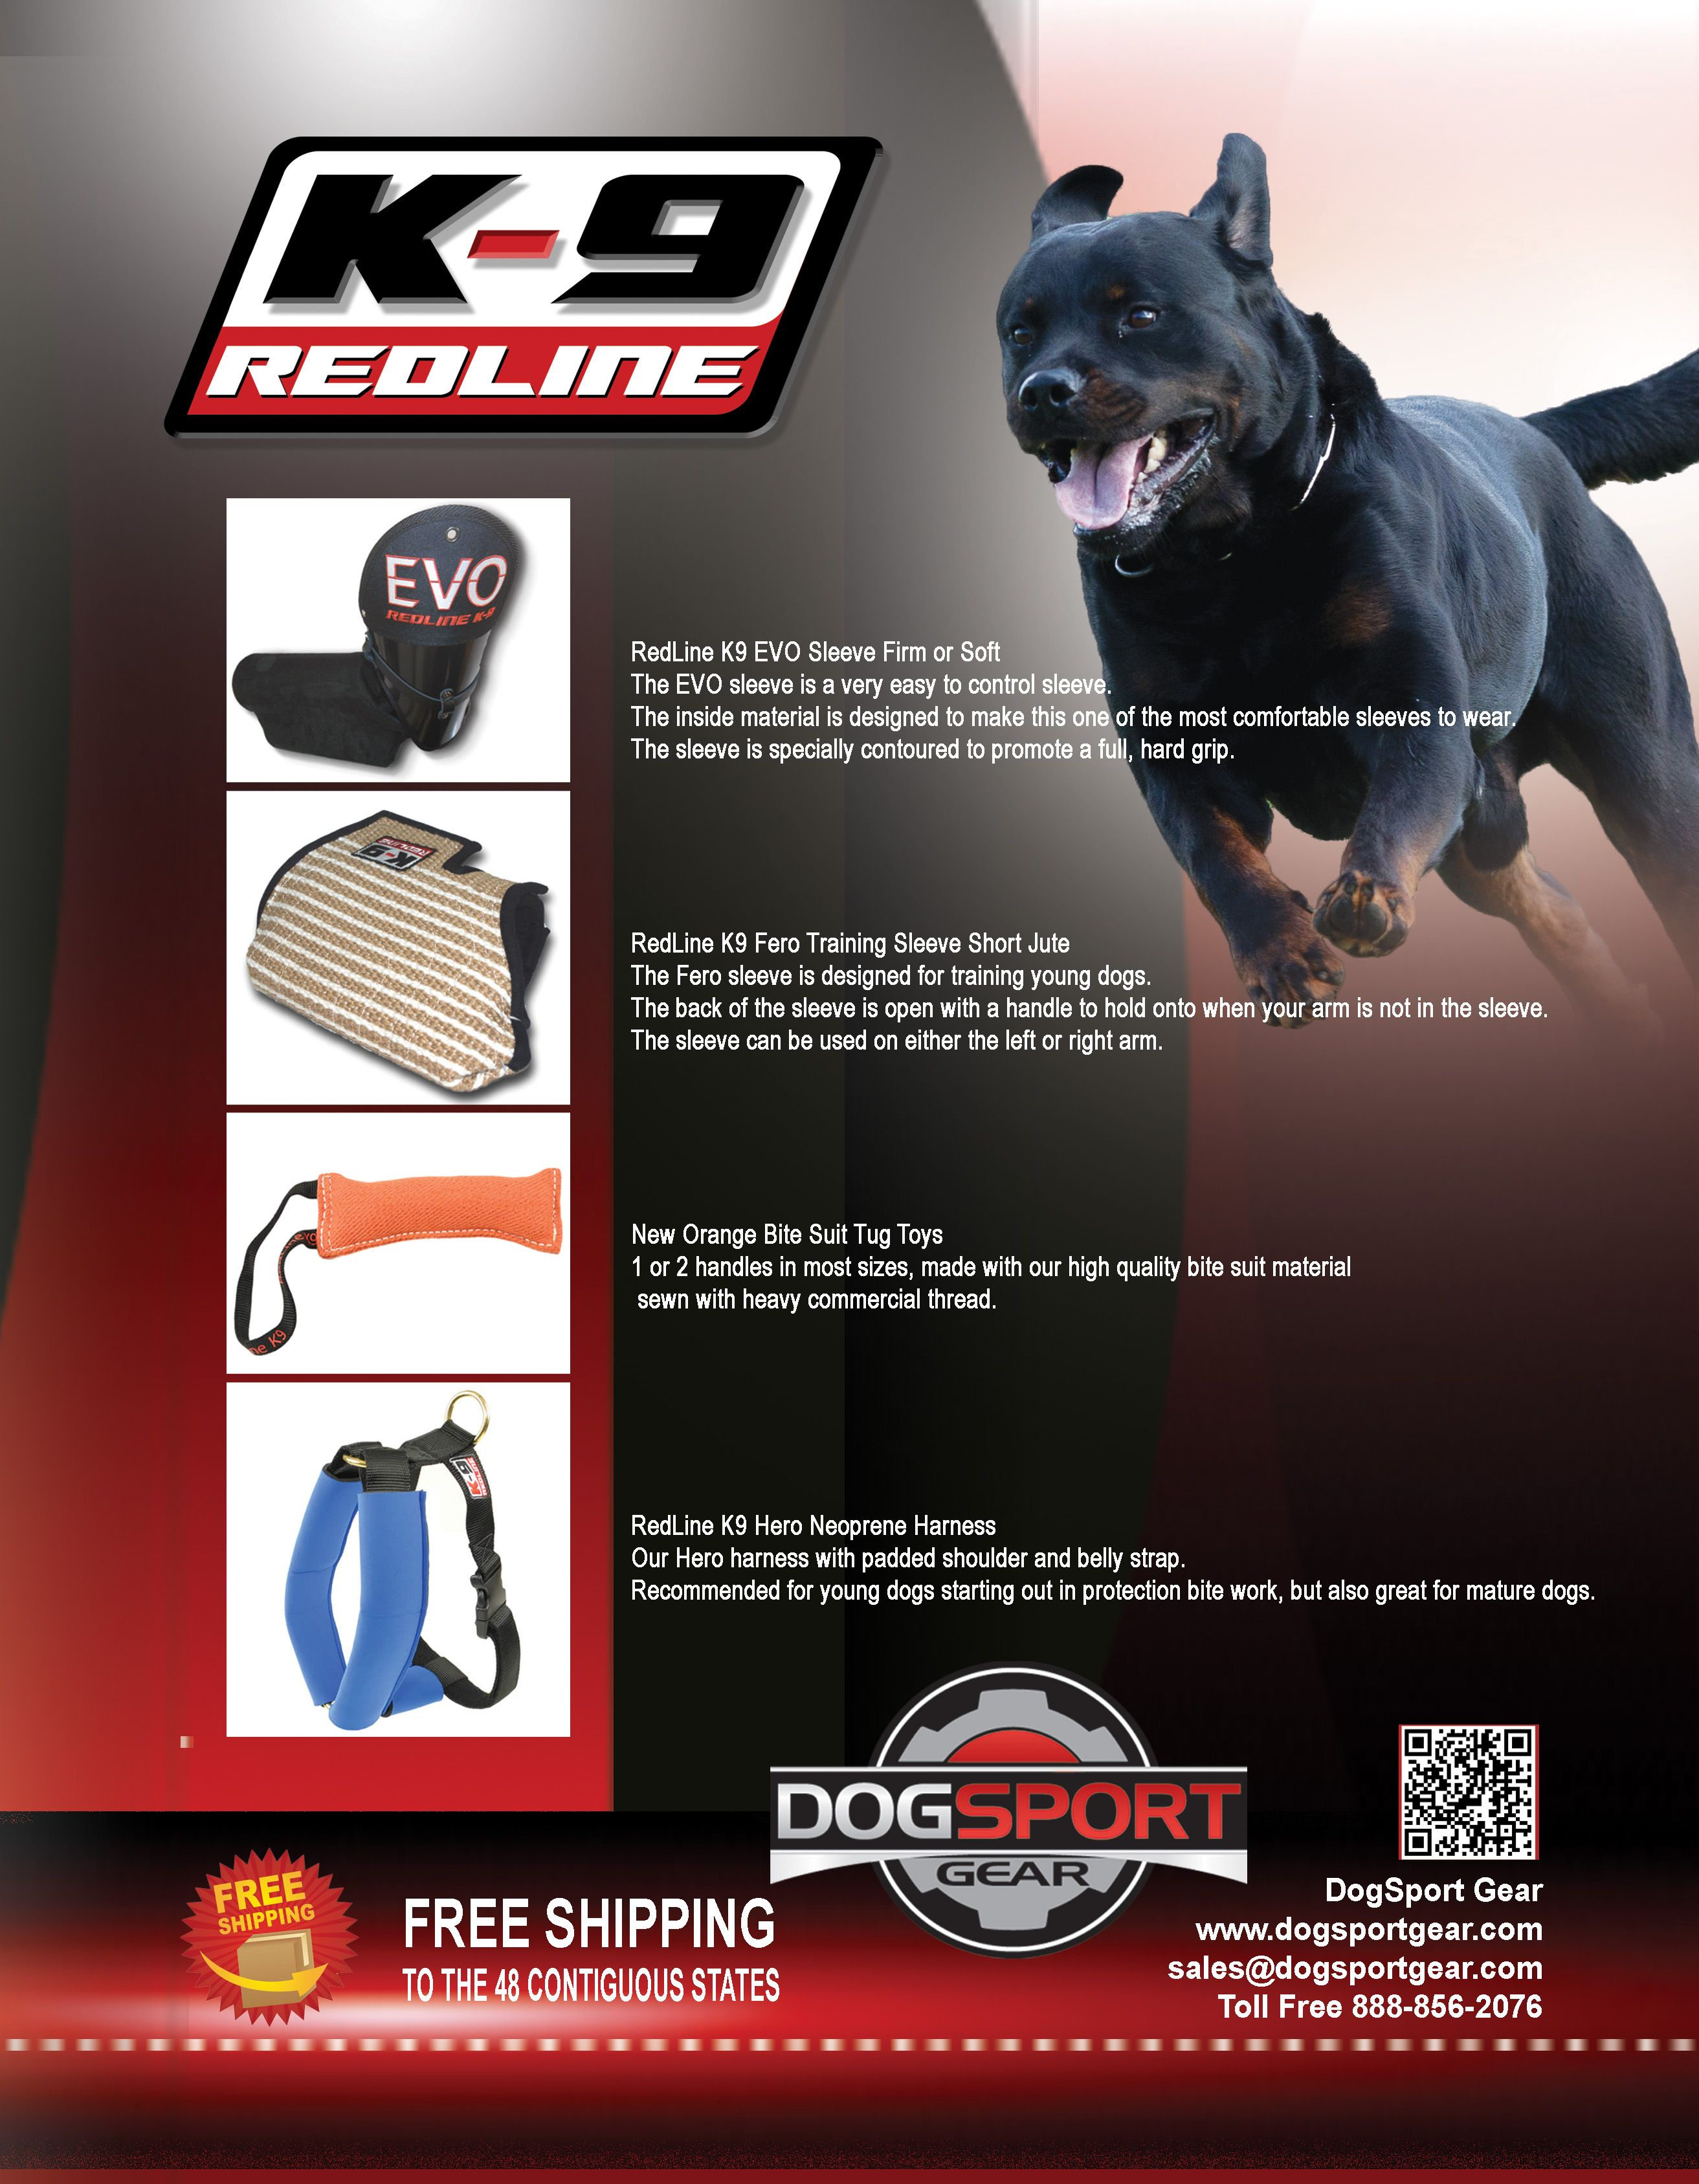 Www Dogsportgear Com Official Sponsor Of Rkna When Ordering Make